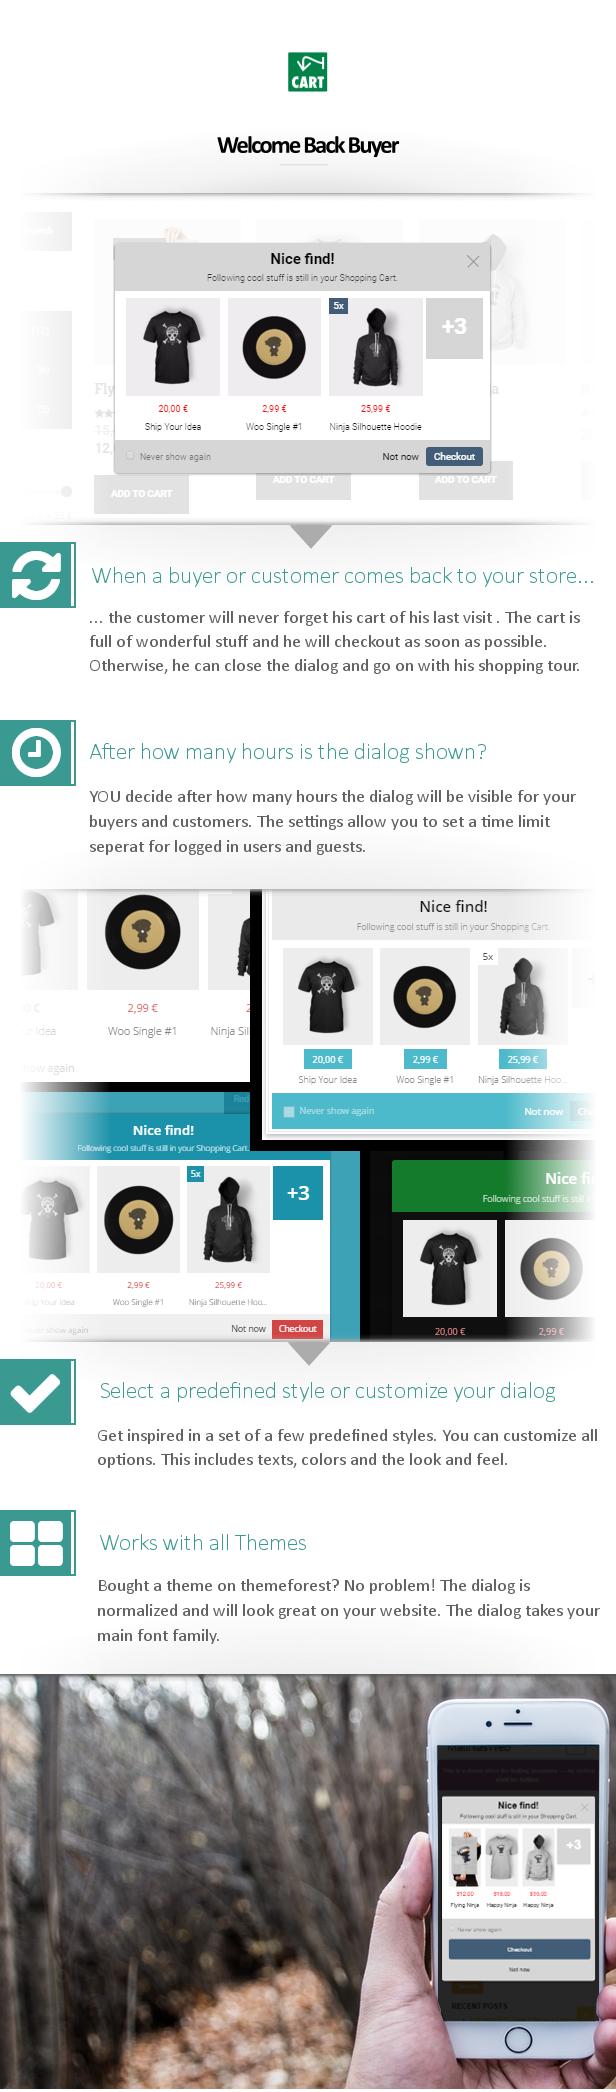 WooCommerce Userfriendly Cart Reminder - 3